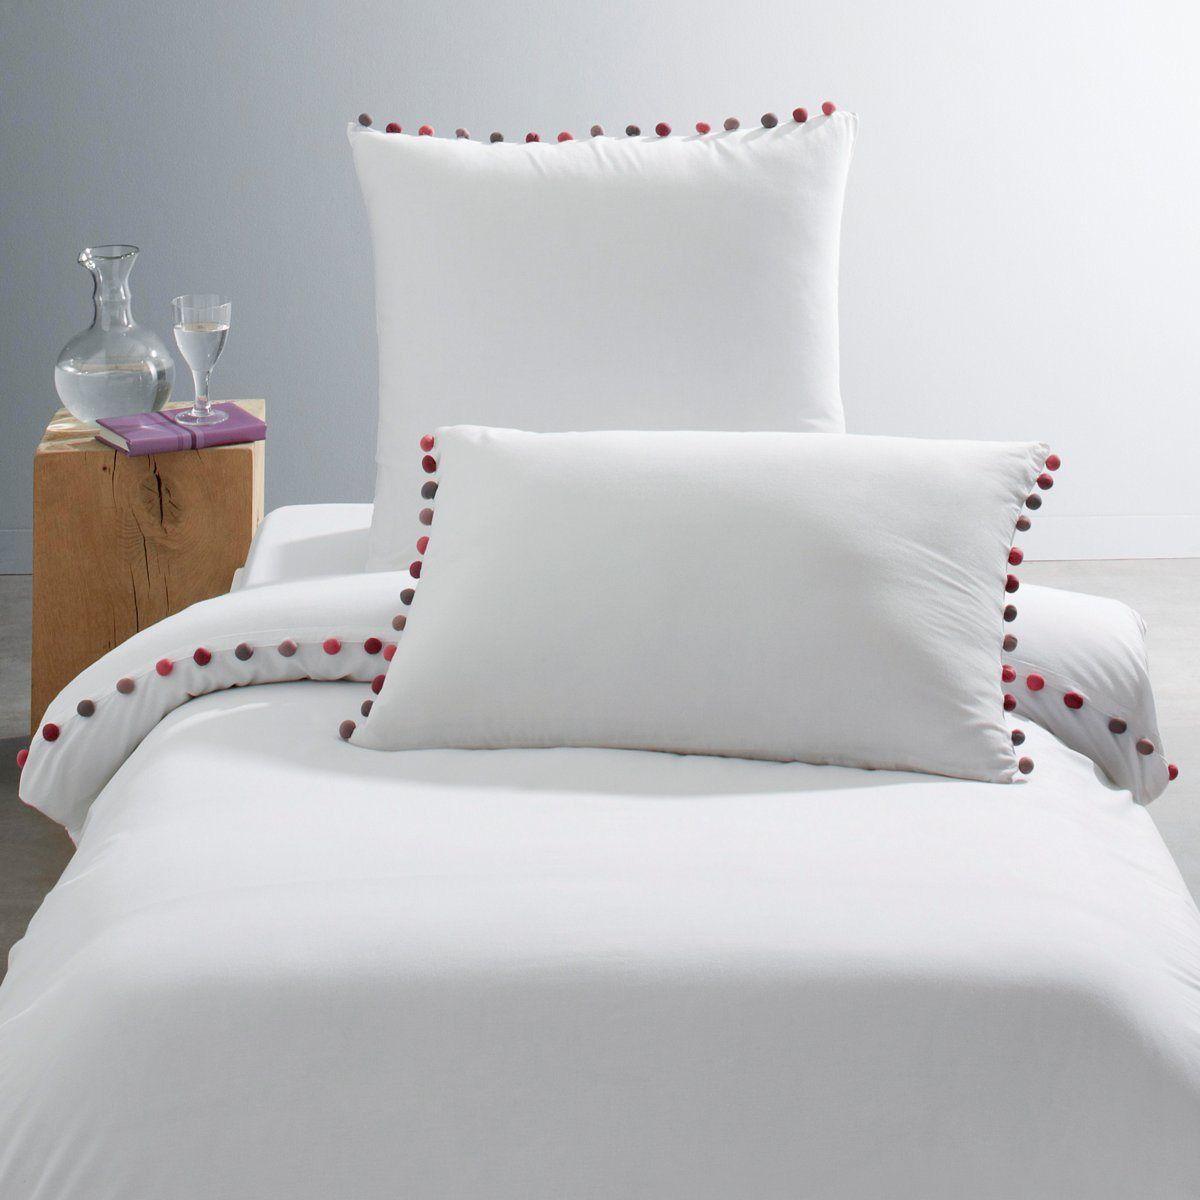 housse de couette percale patati pillow fabric cushion. Black Bedroom Furniture Sets. Home Design Ideas